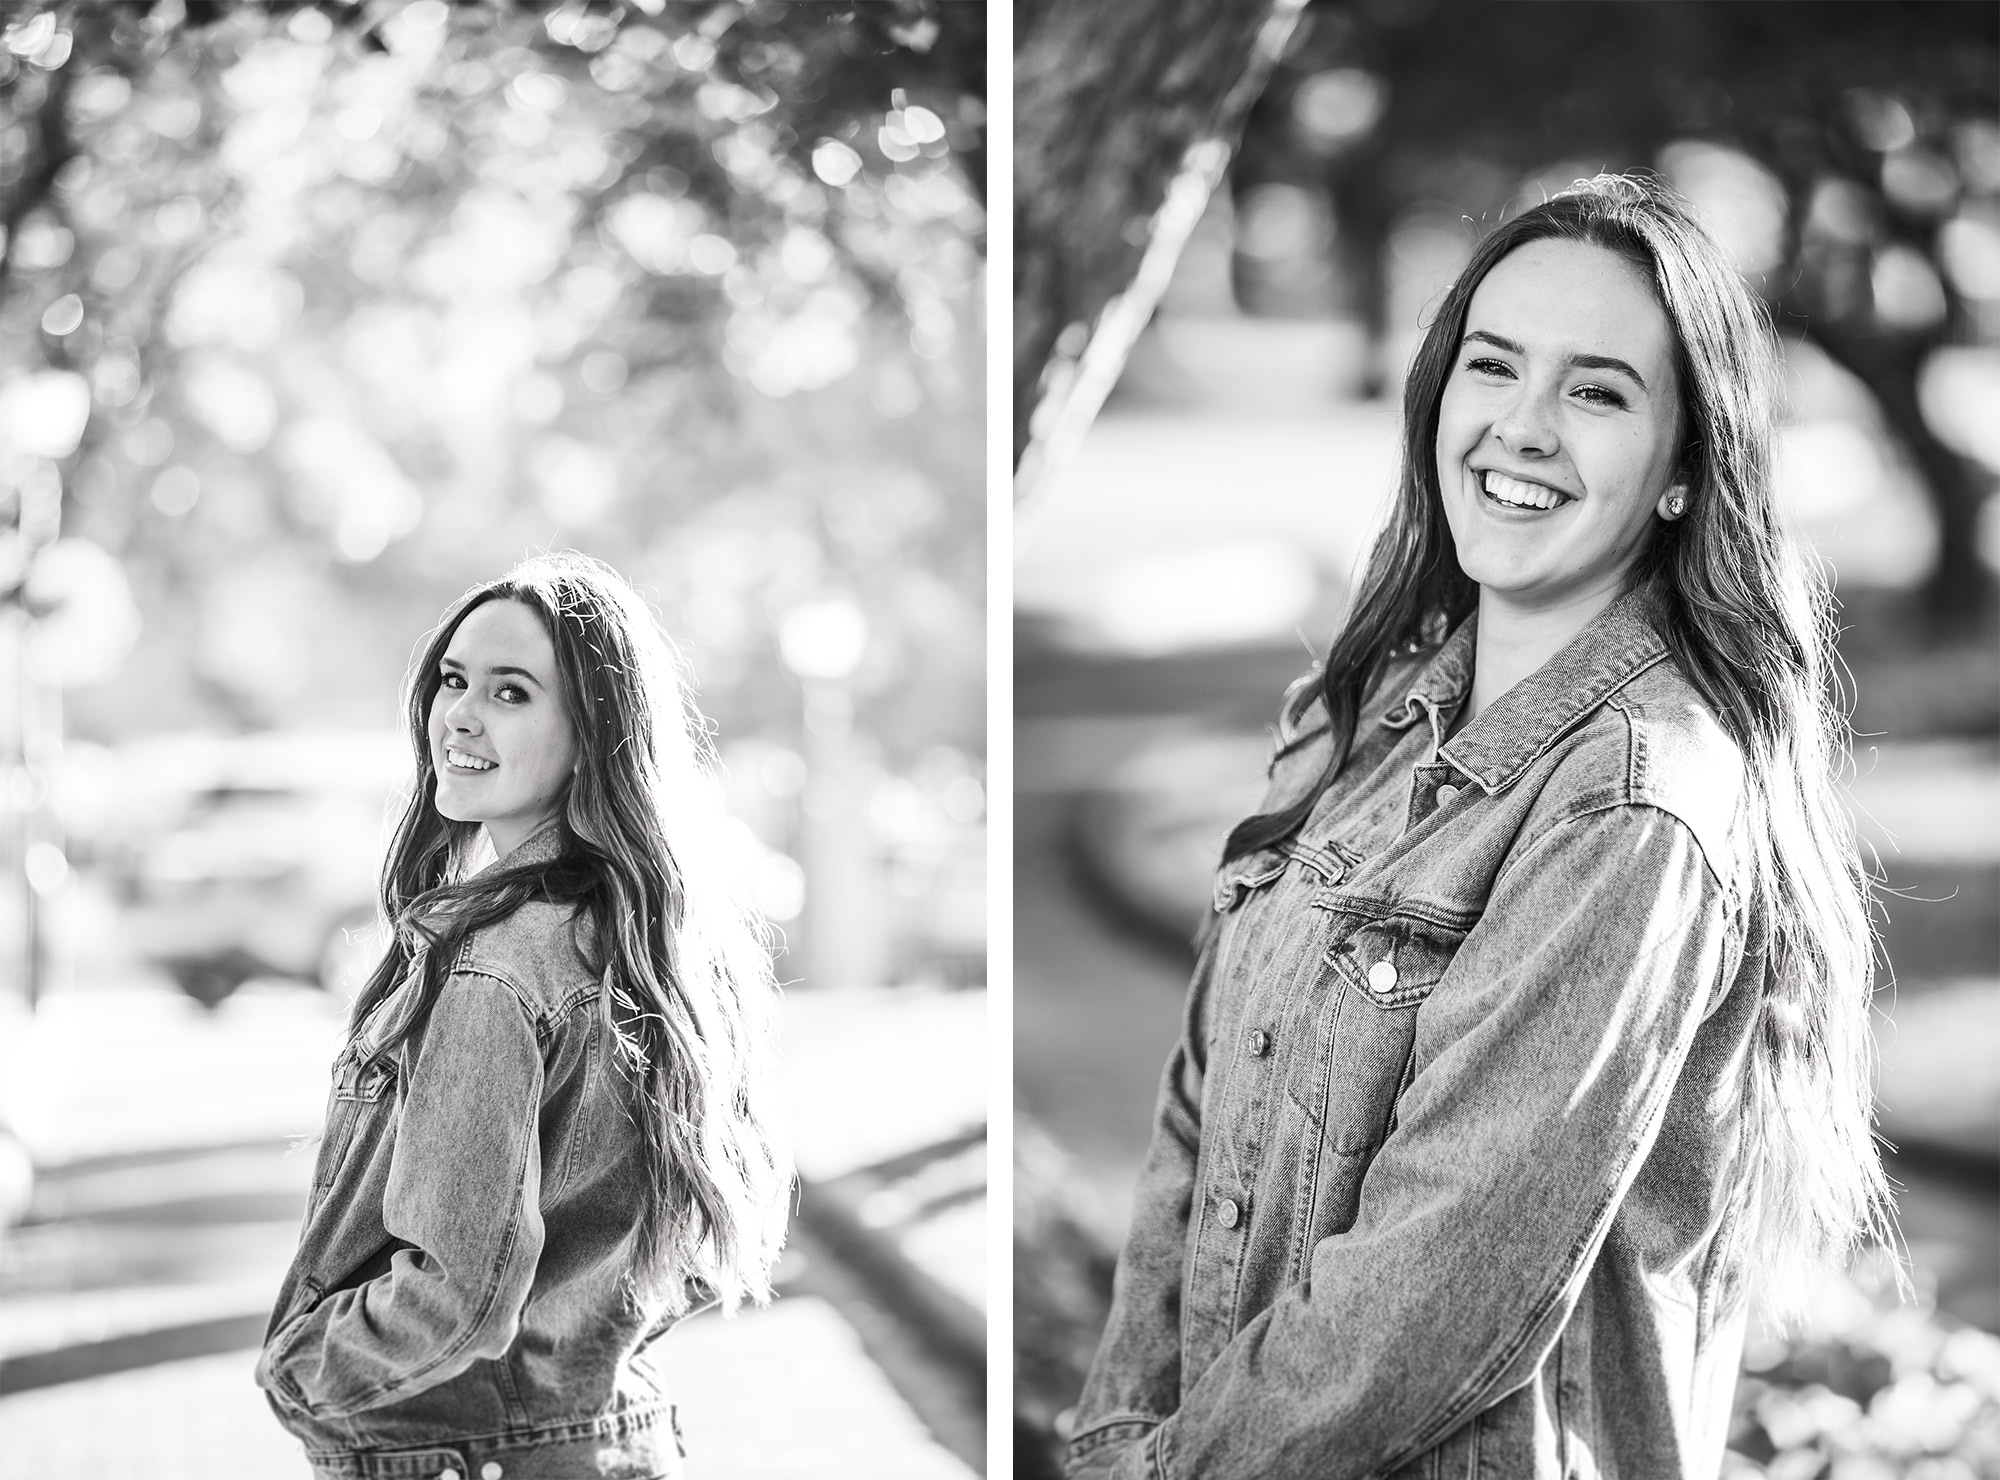 Somerville Senior Portrait Photographer | Stephen Grant Photography